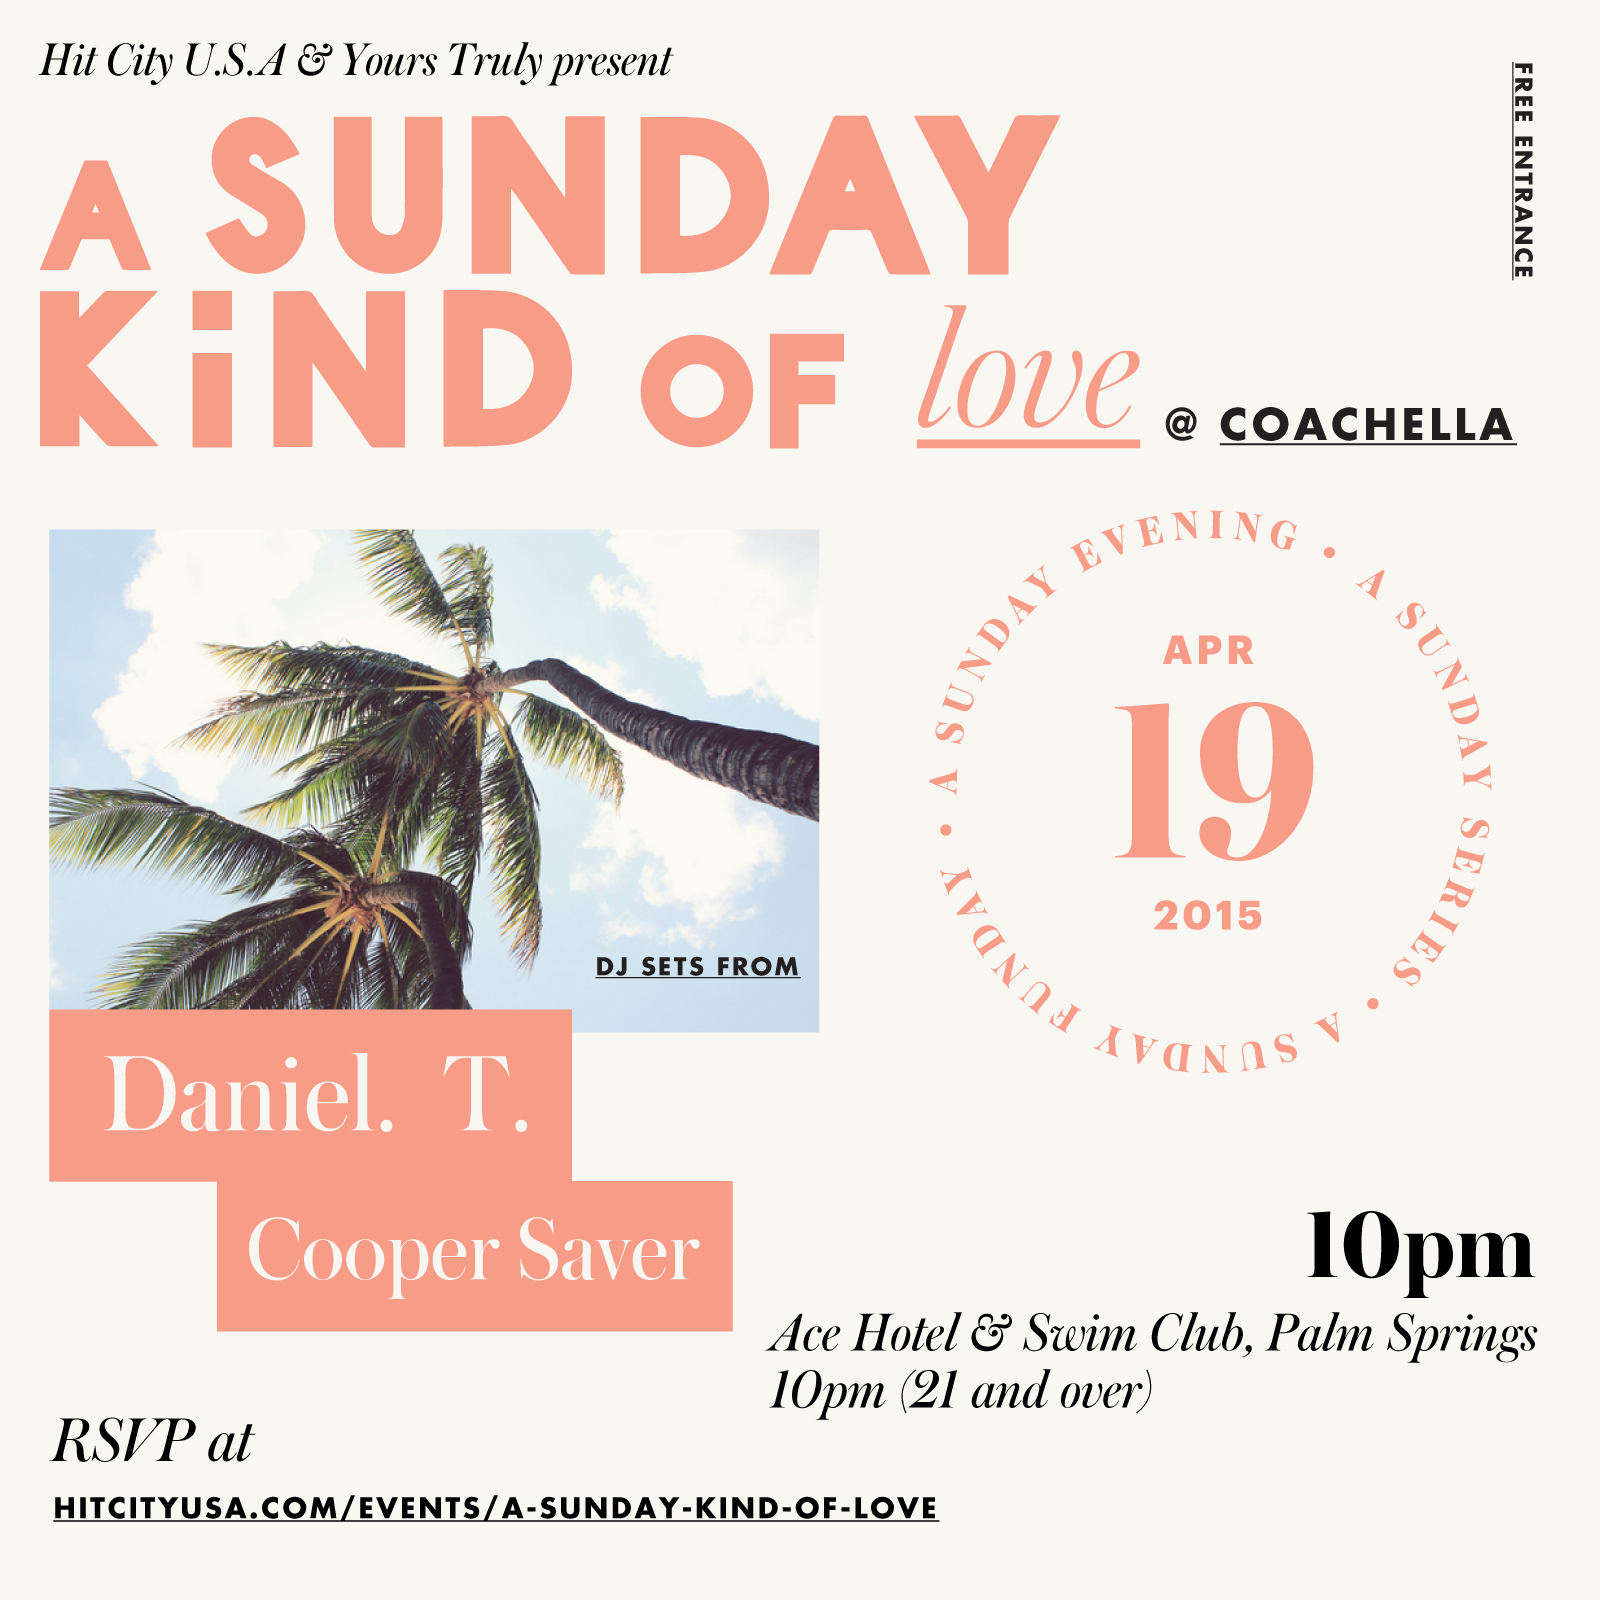 A Sunday Kind of Love @ Coachella Weekend 2